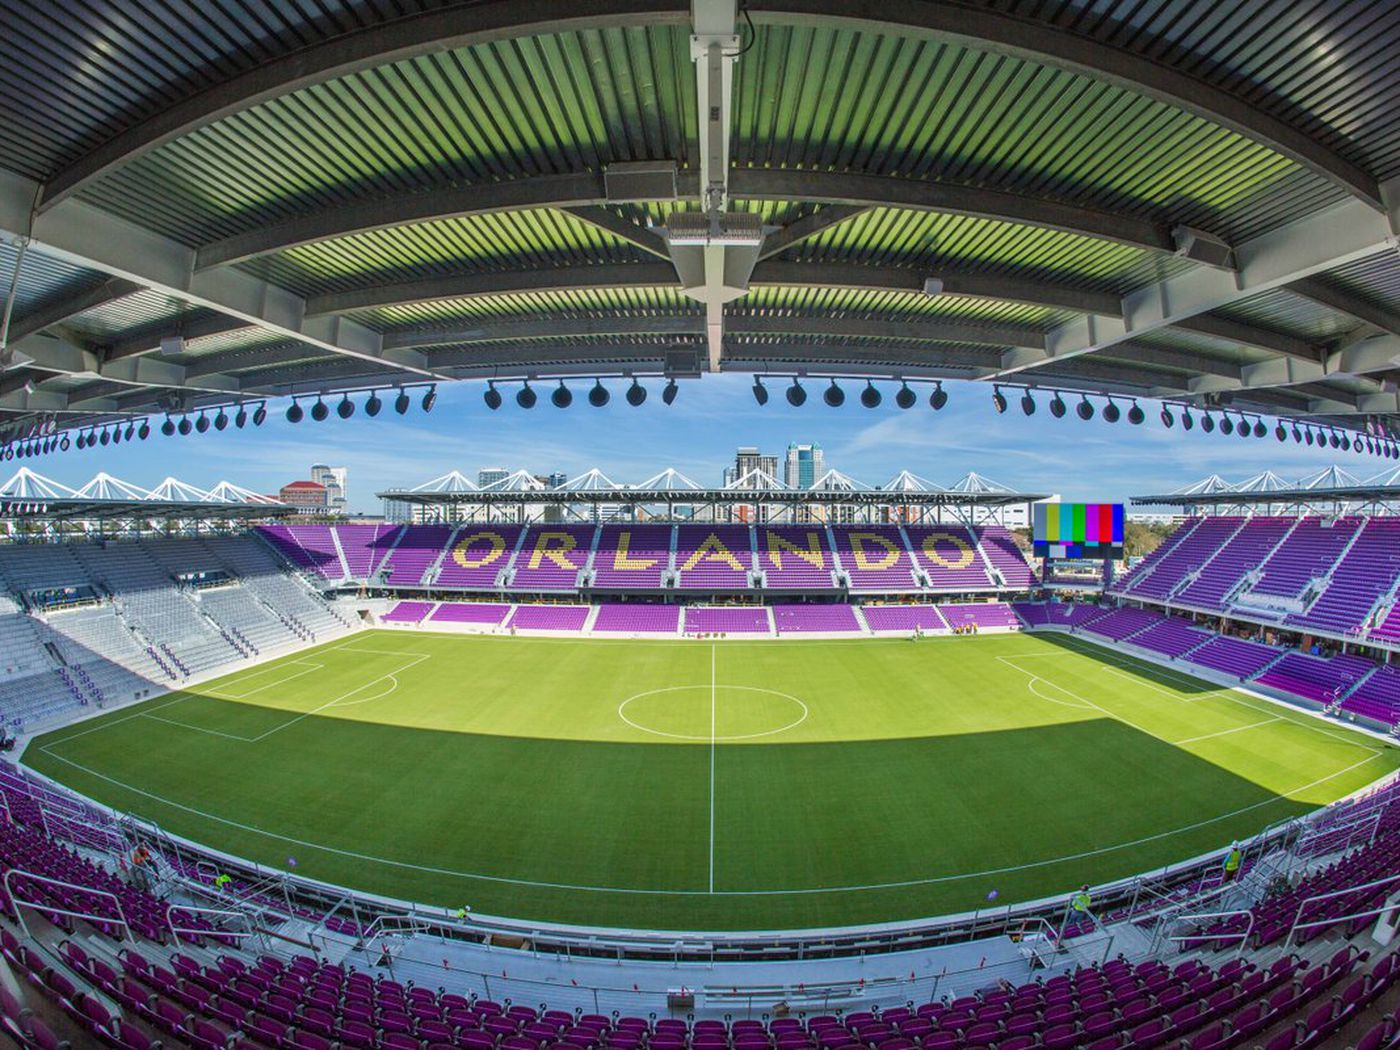 Orlando City S Full Schedule Announced For The 2019 Major League Soccer Season The Mane Land